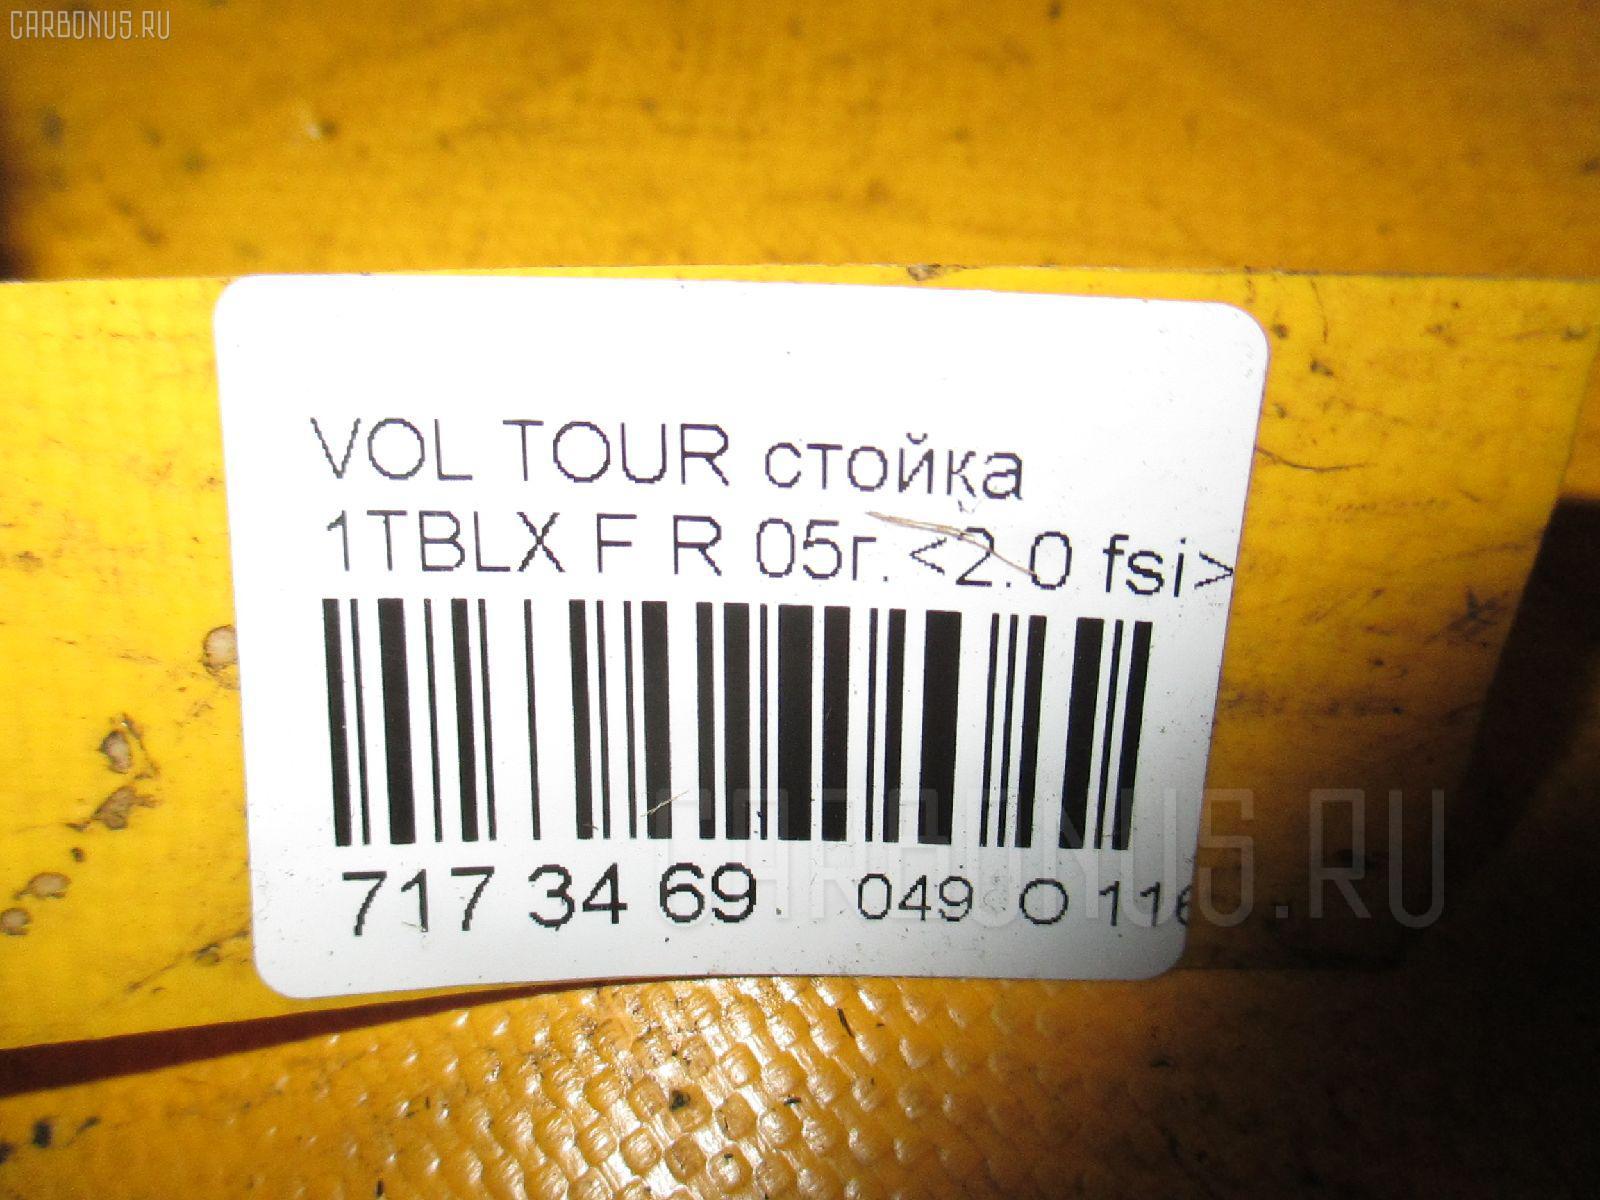 Стойка VOLKSWAGEN TOURAN 1TBLX BLX Фото 3